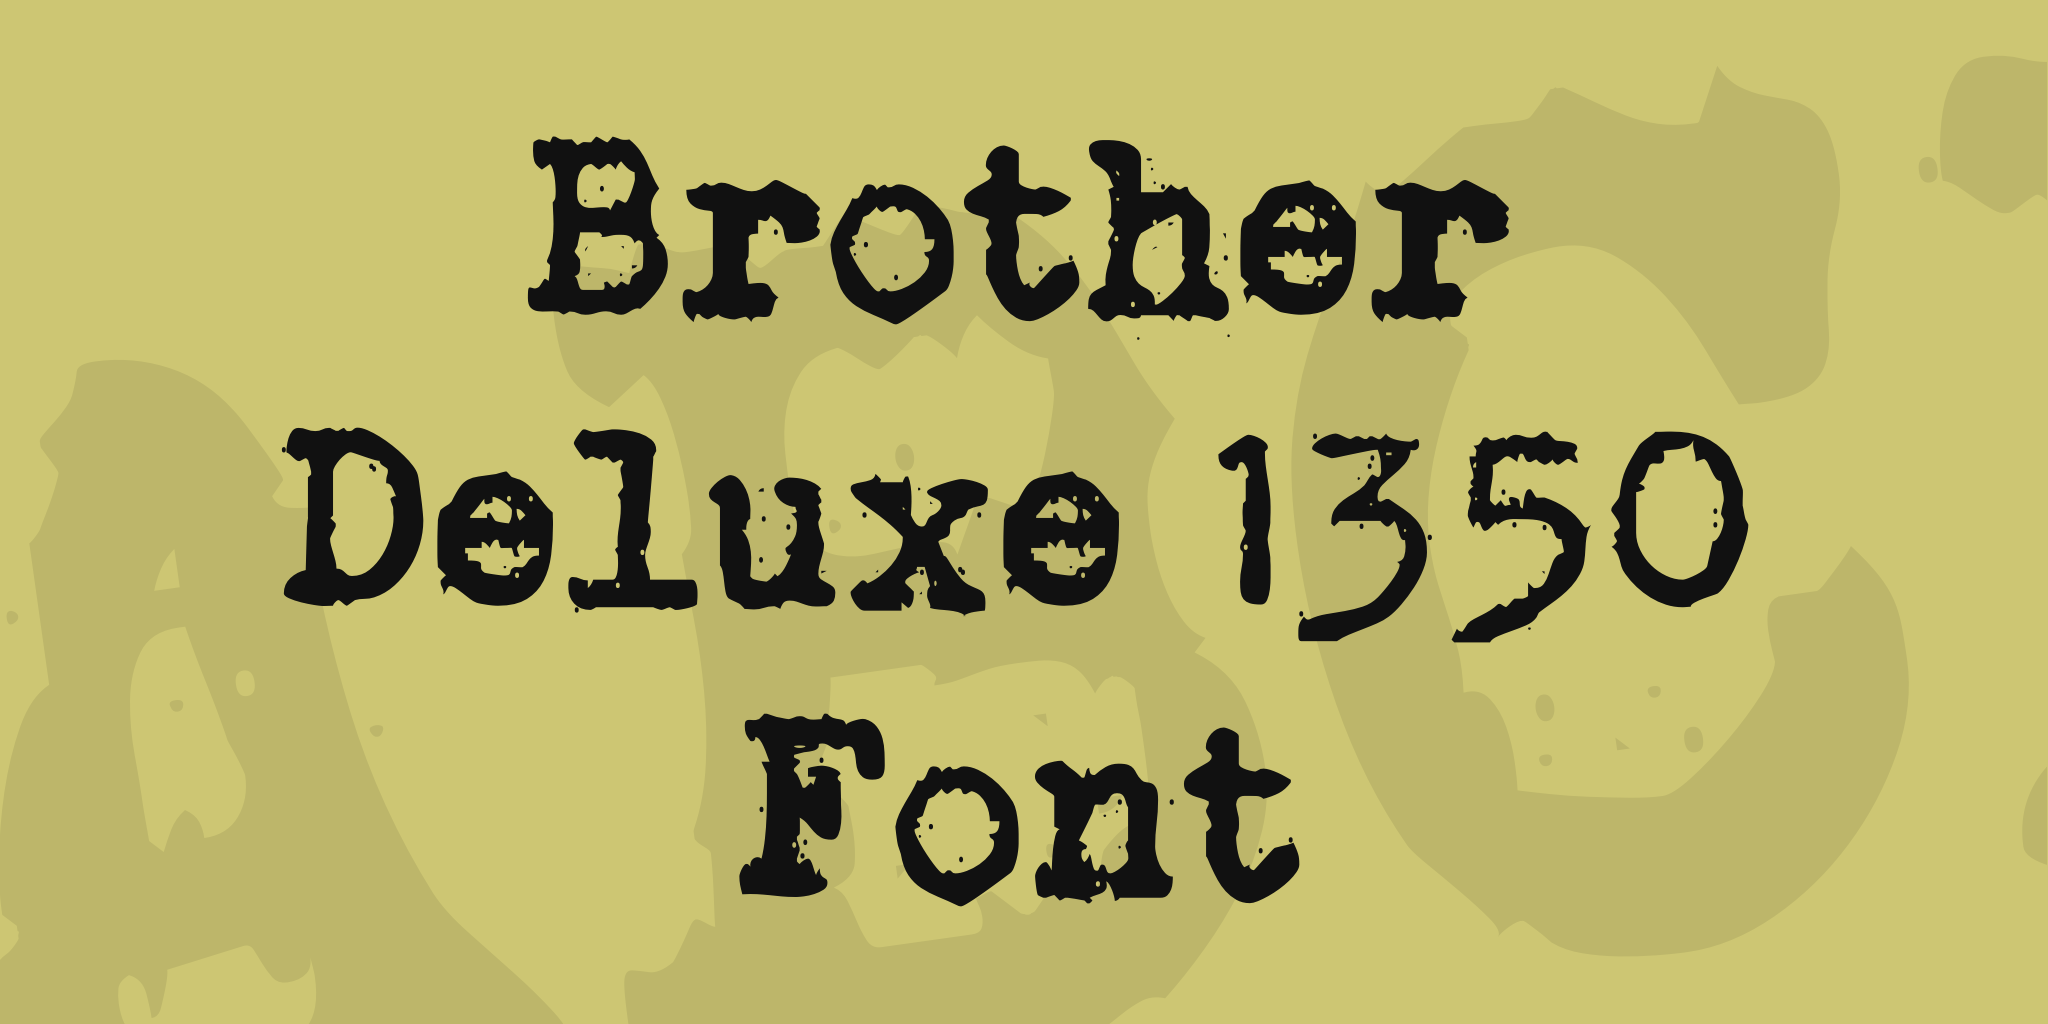 Tipografía máquina de escribir